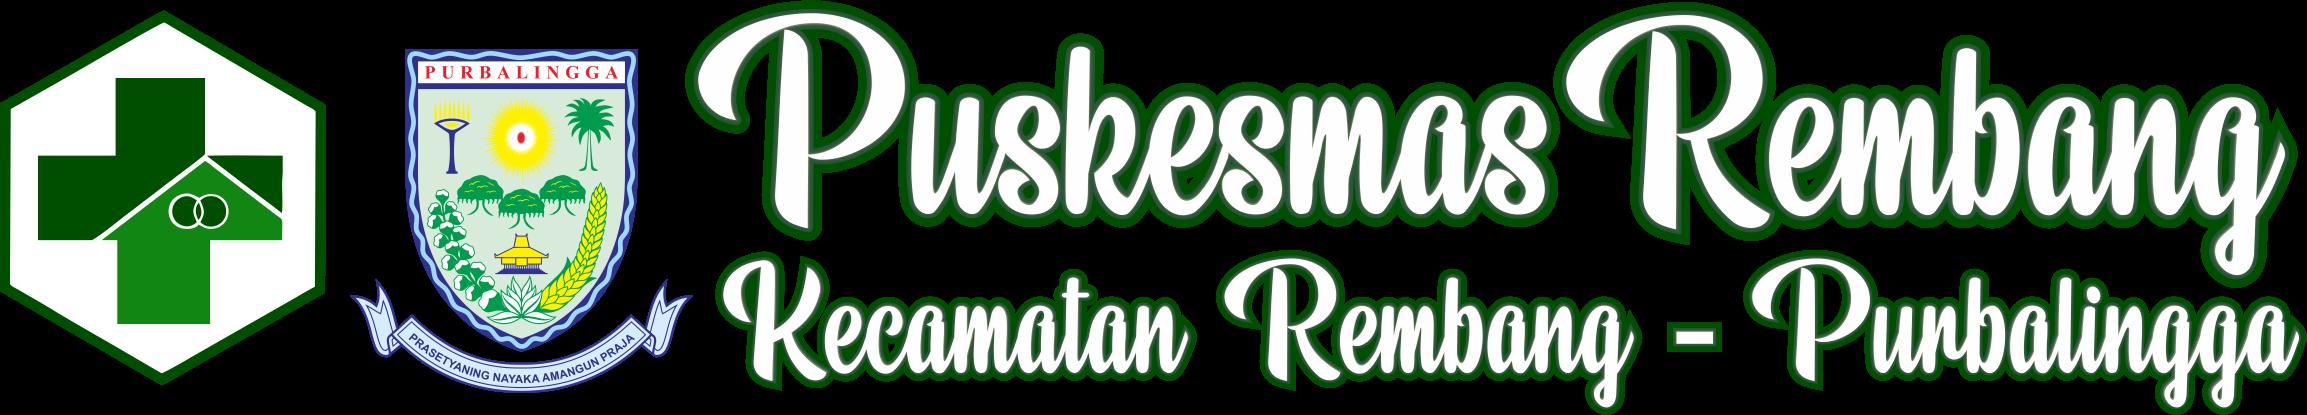 Puskesmas Rembang